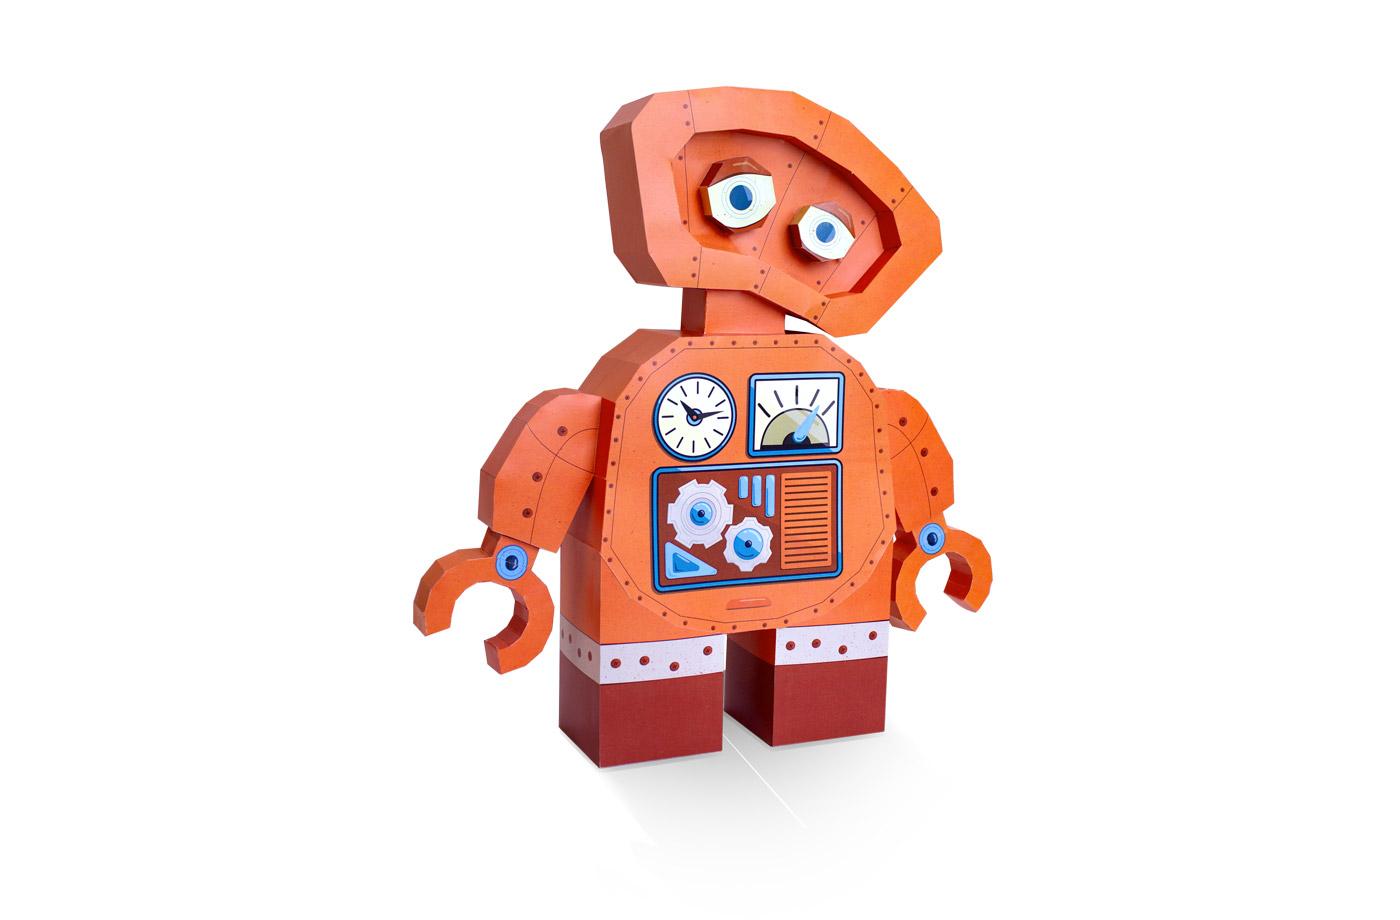 Robot en papier 3D 7 3701310201077